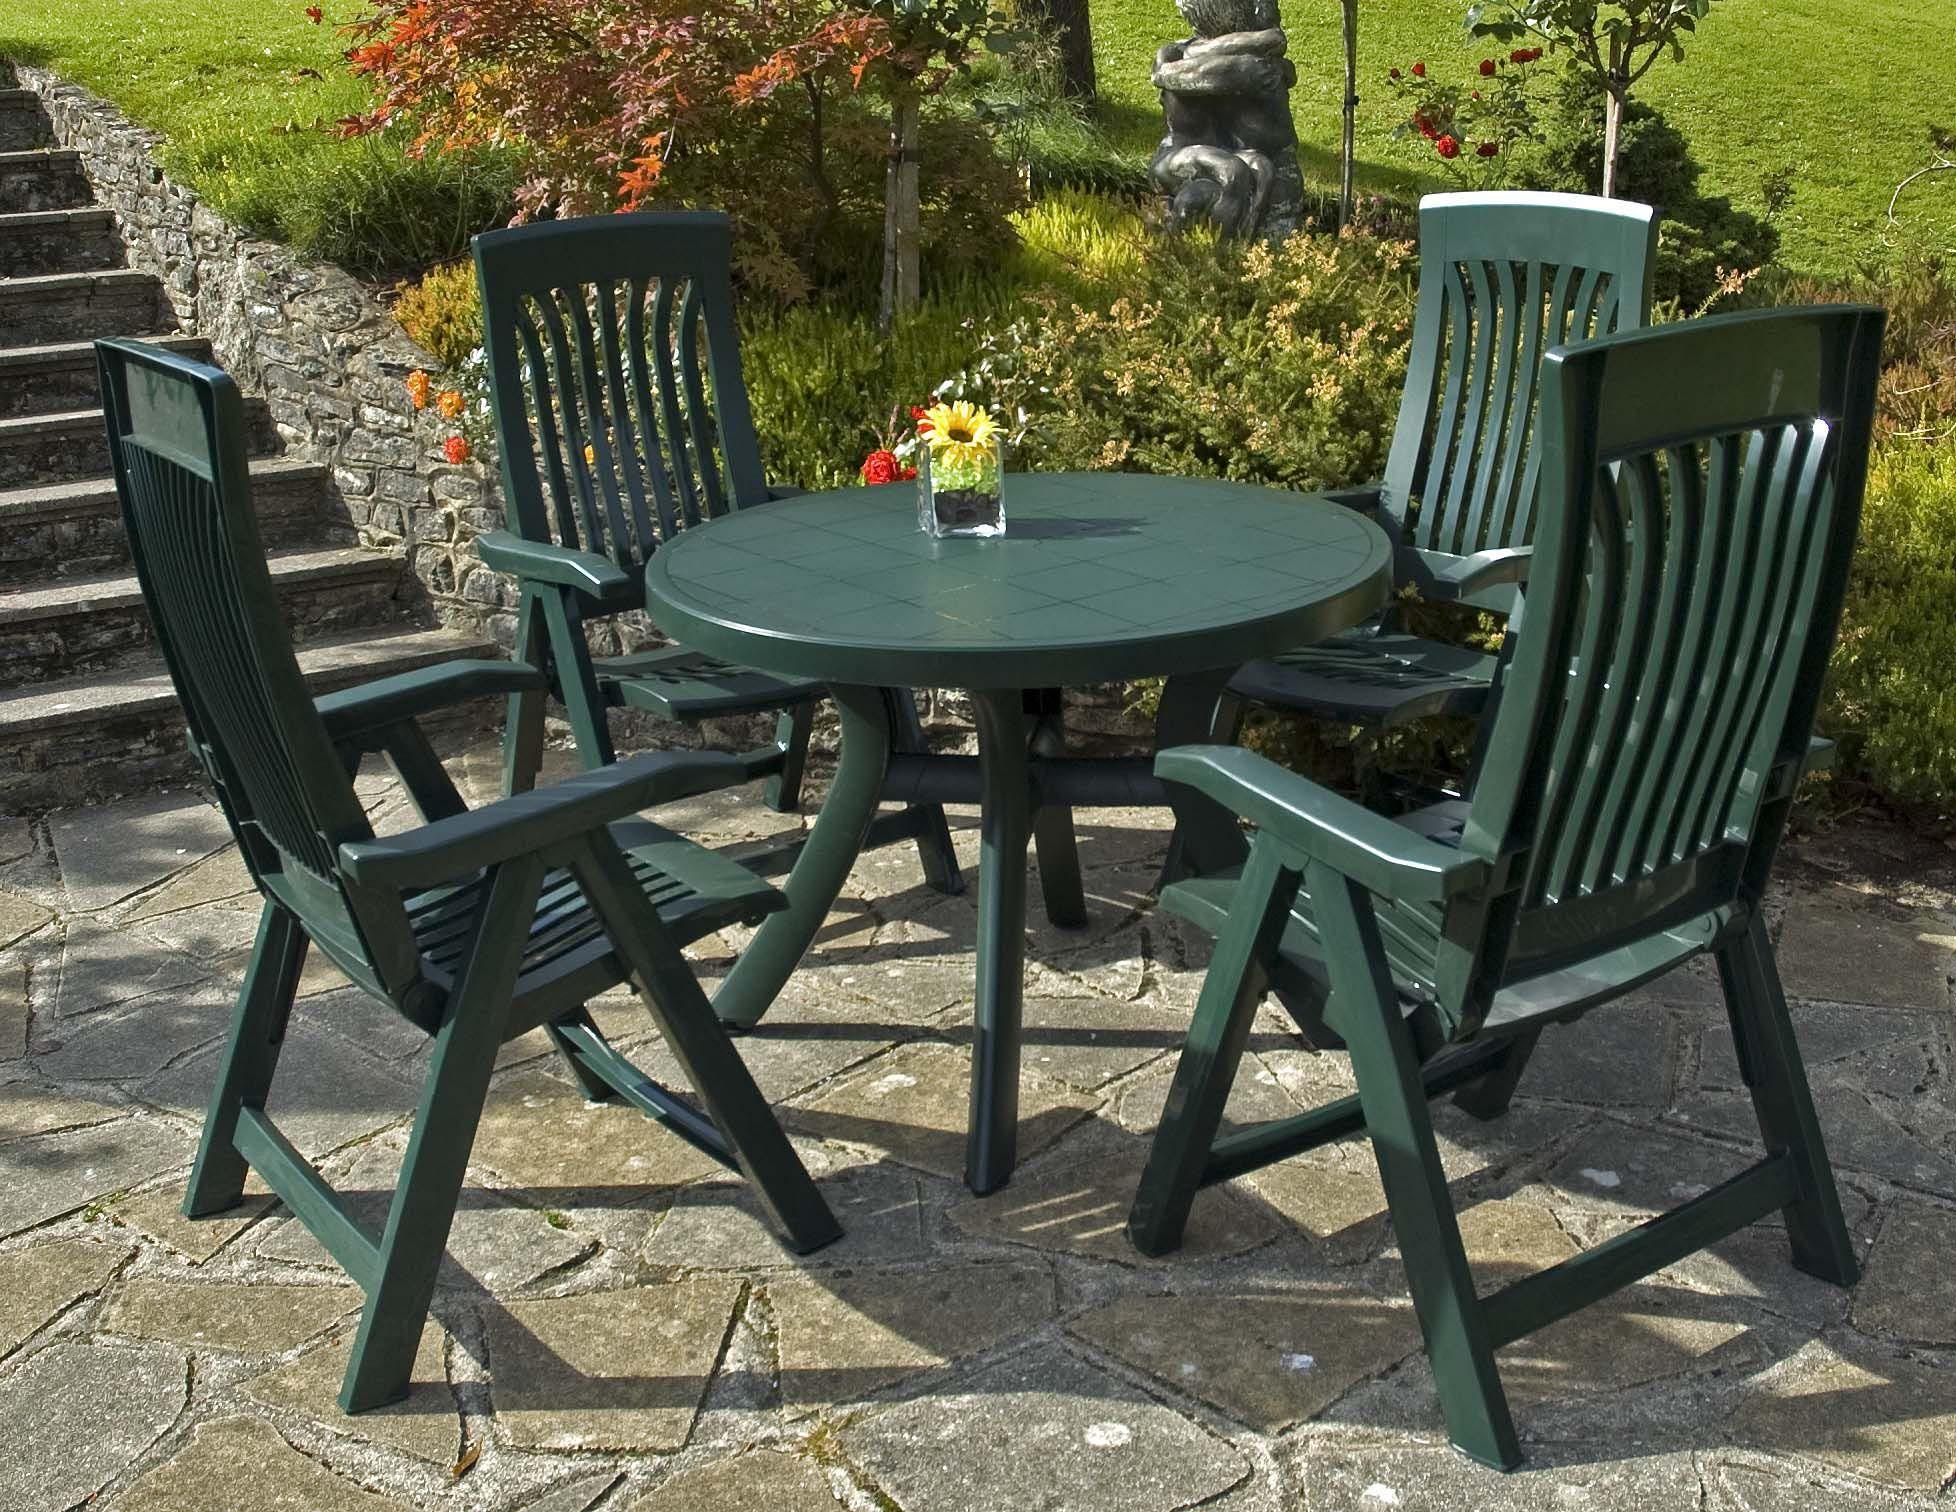 Backyard Chairs Furniture Ideas Plastic